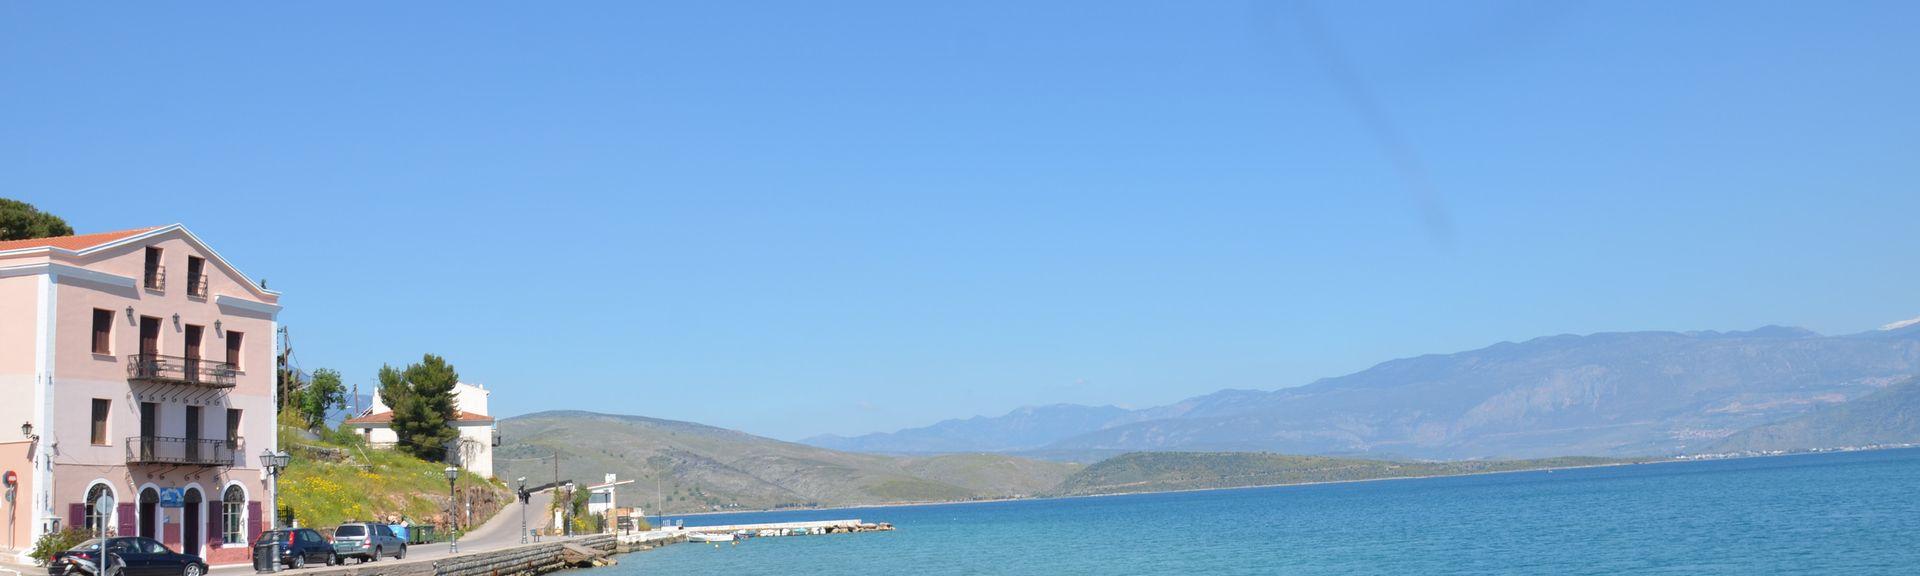 Fokis, Thessalia ja Keski-Kreikka, Kreikka